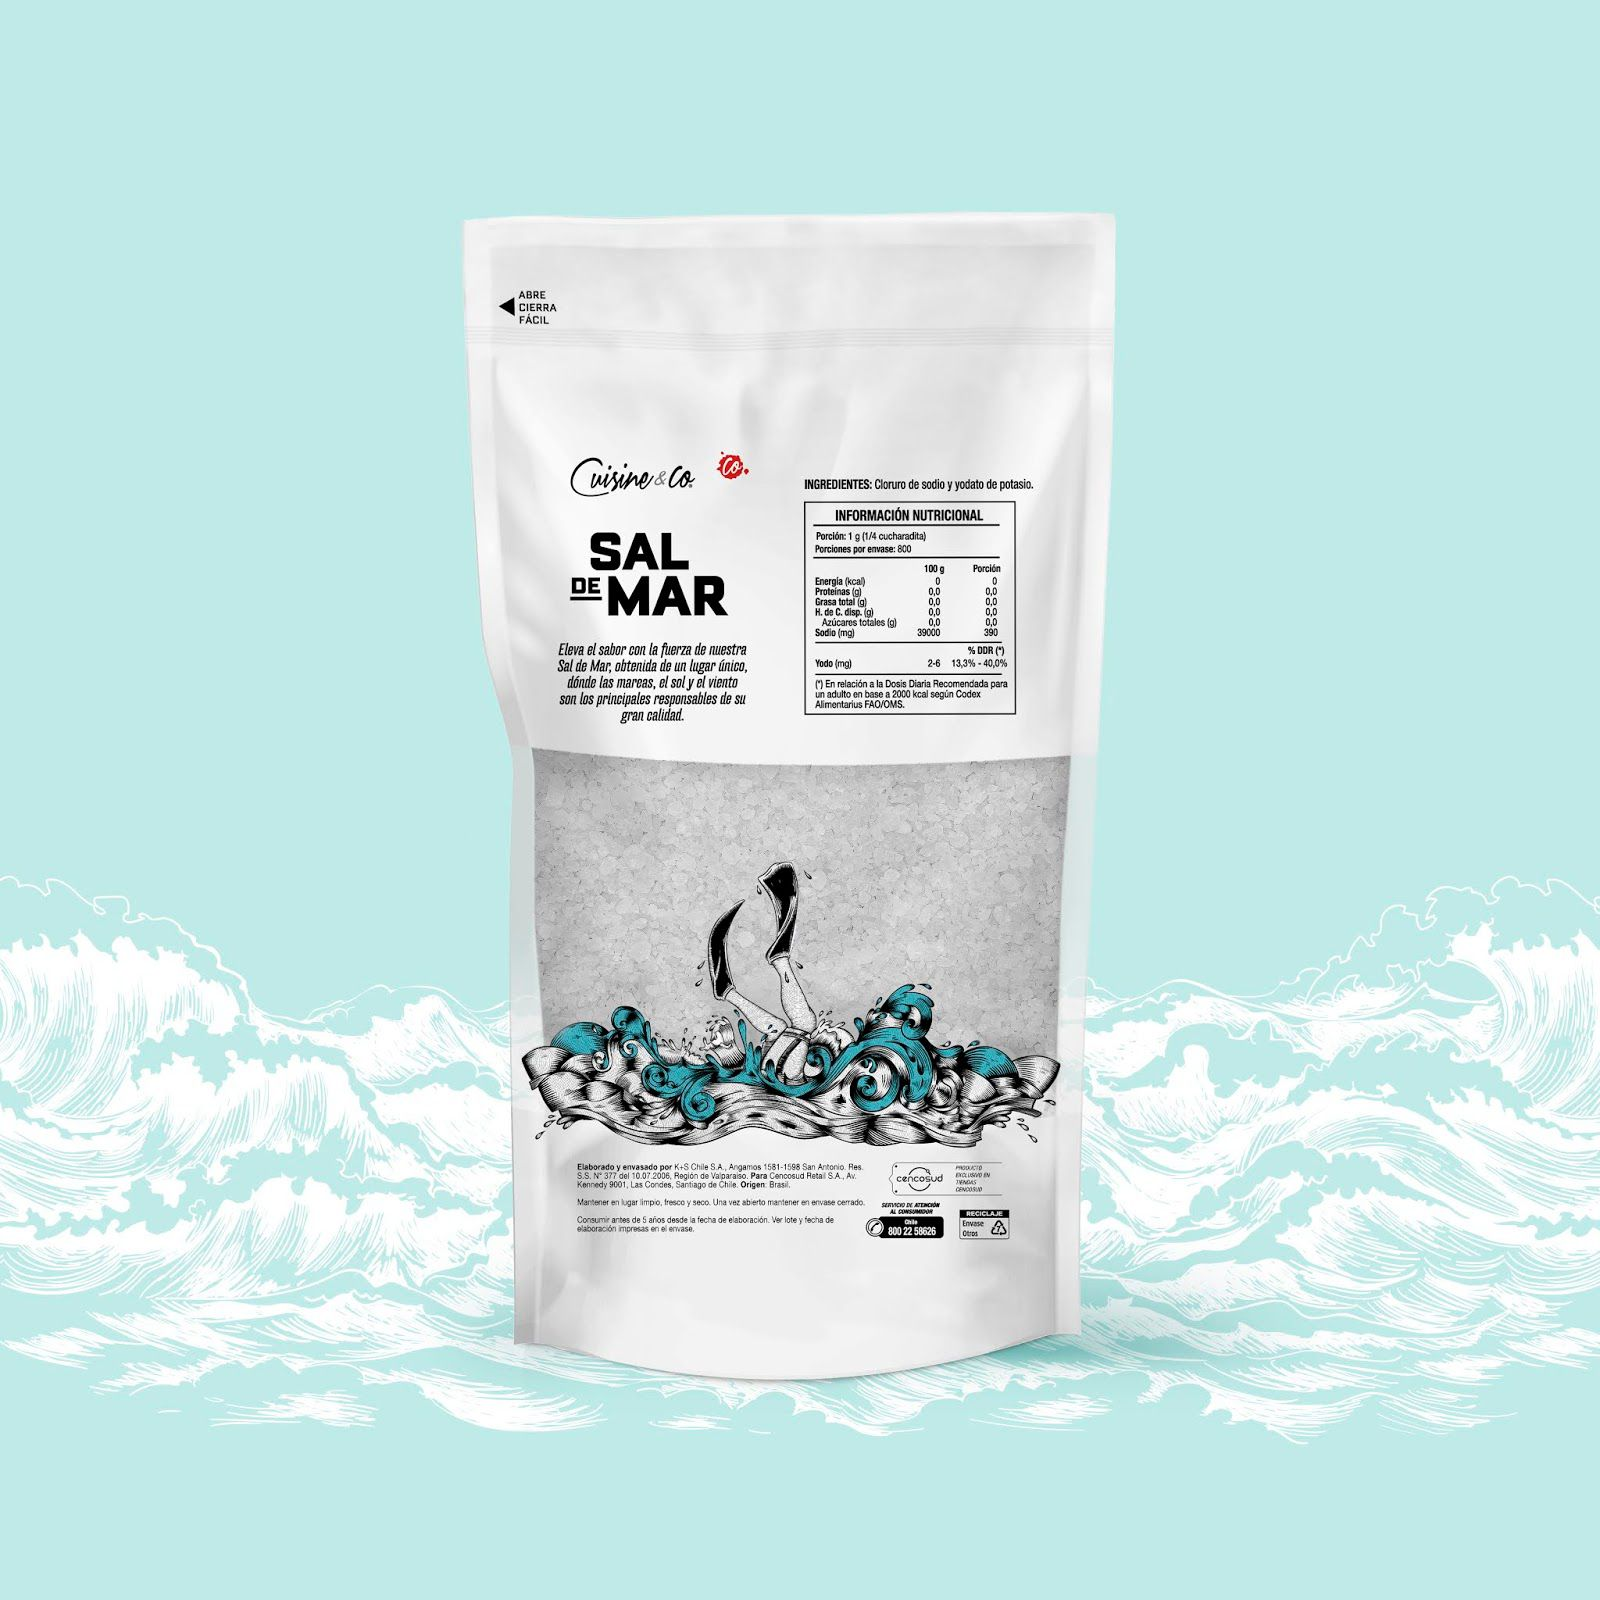 """Sal de Mar"" - Cuisine&co (sel de mer) I Design : DobleGiro, Chili (juin 2020)"